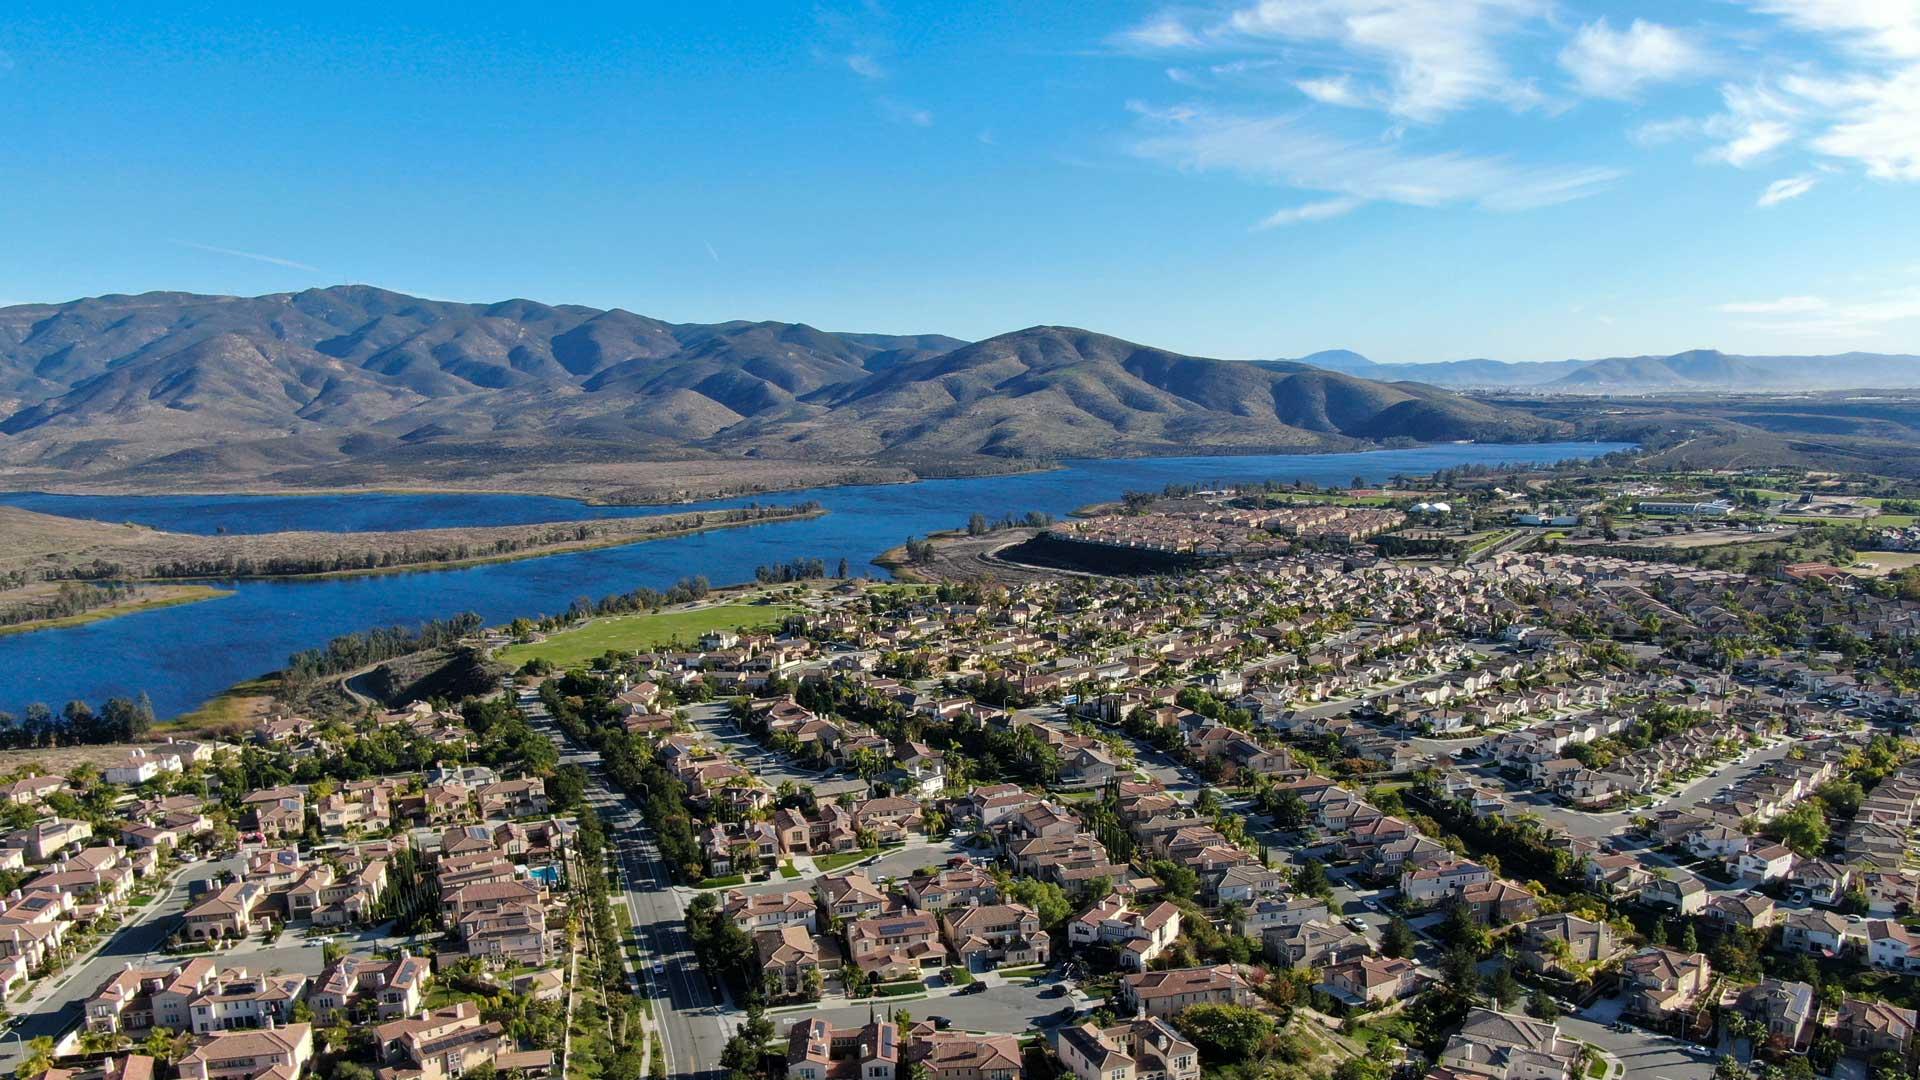 Eastlake/Chula Vista, CA